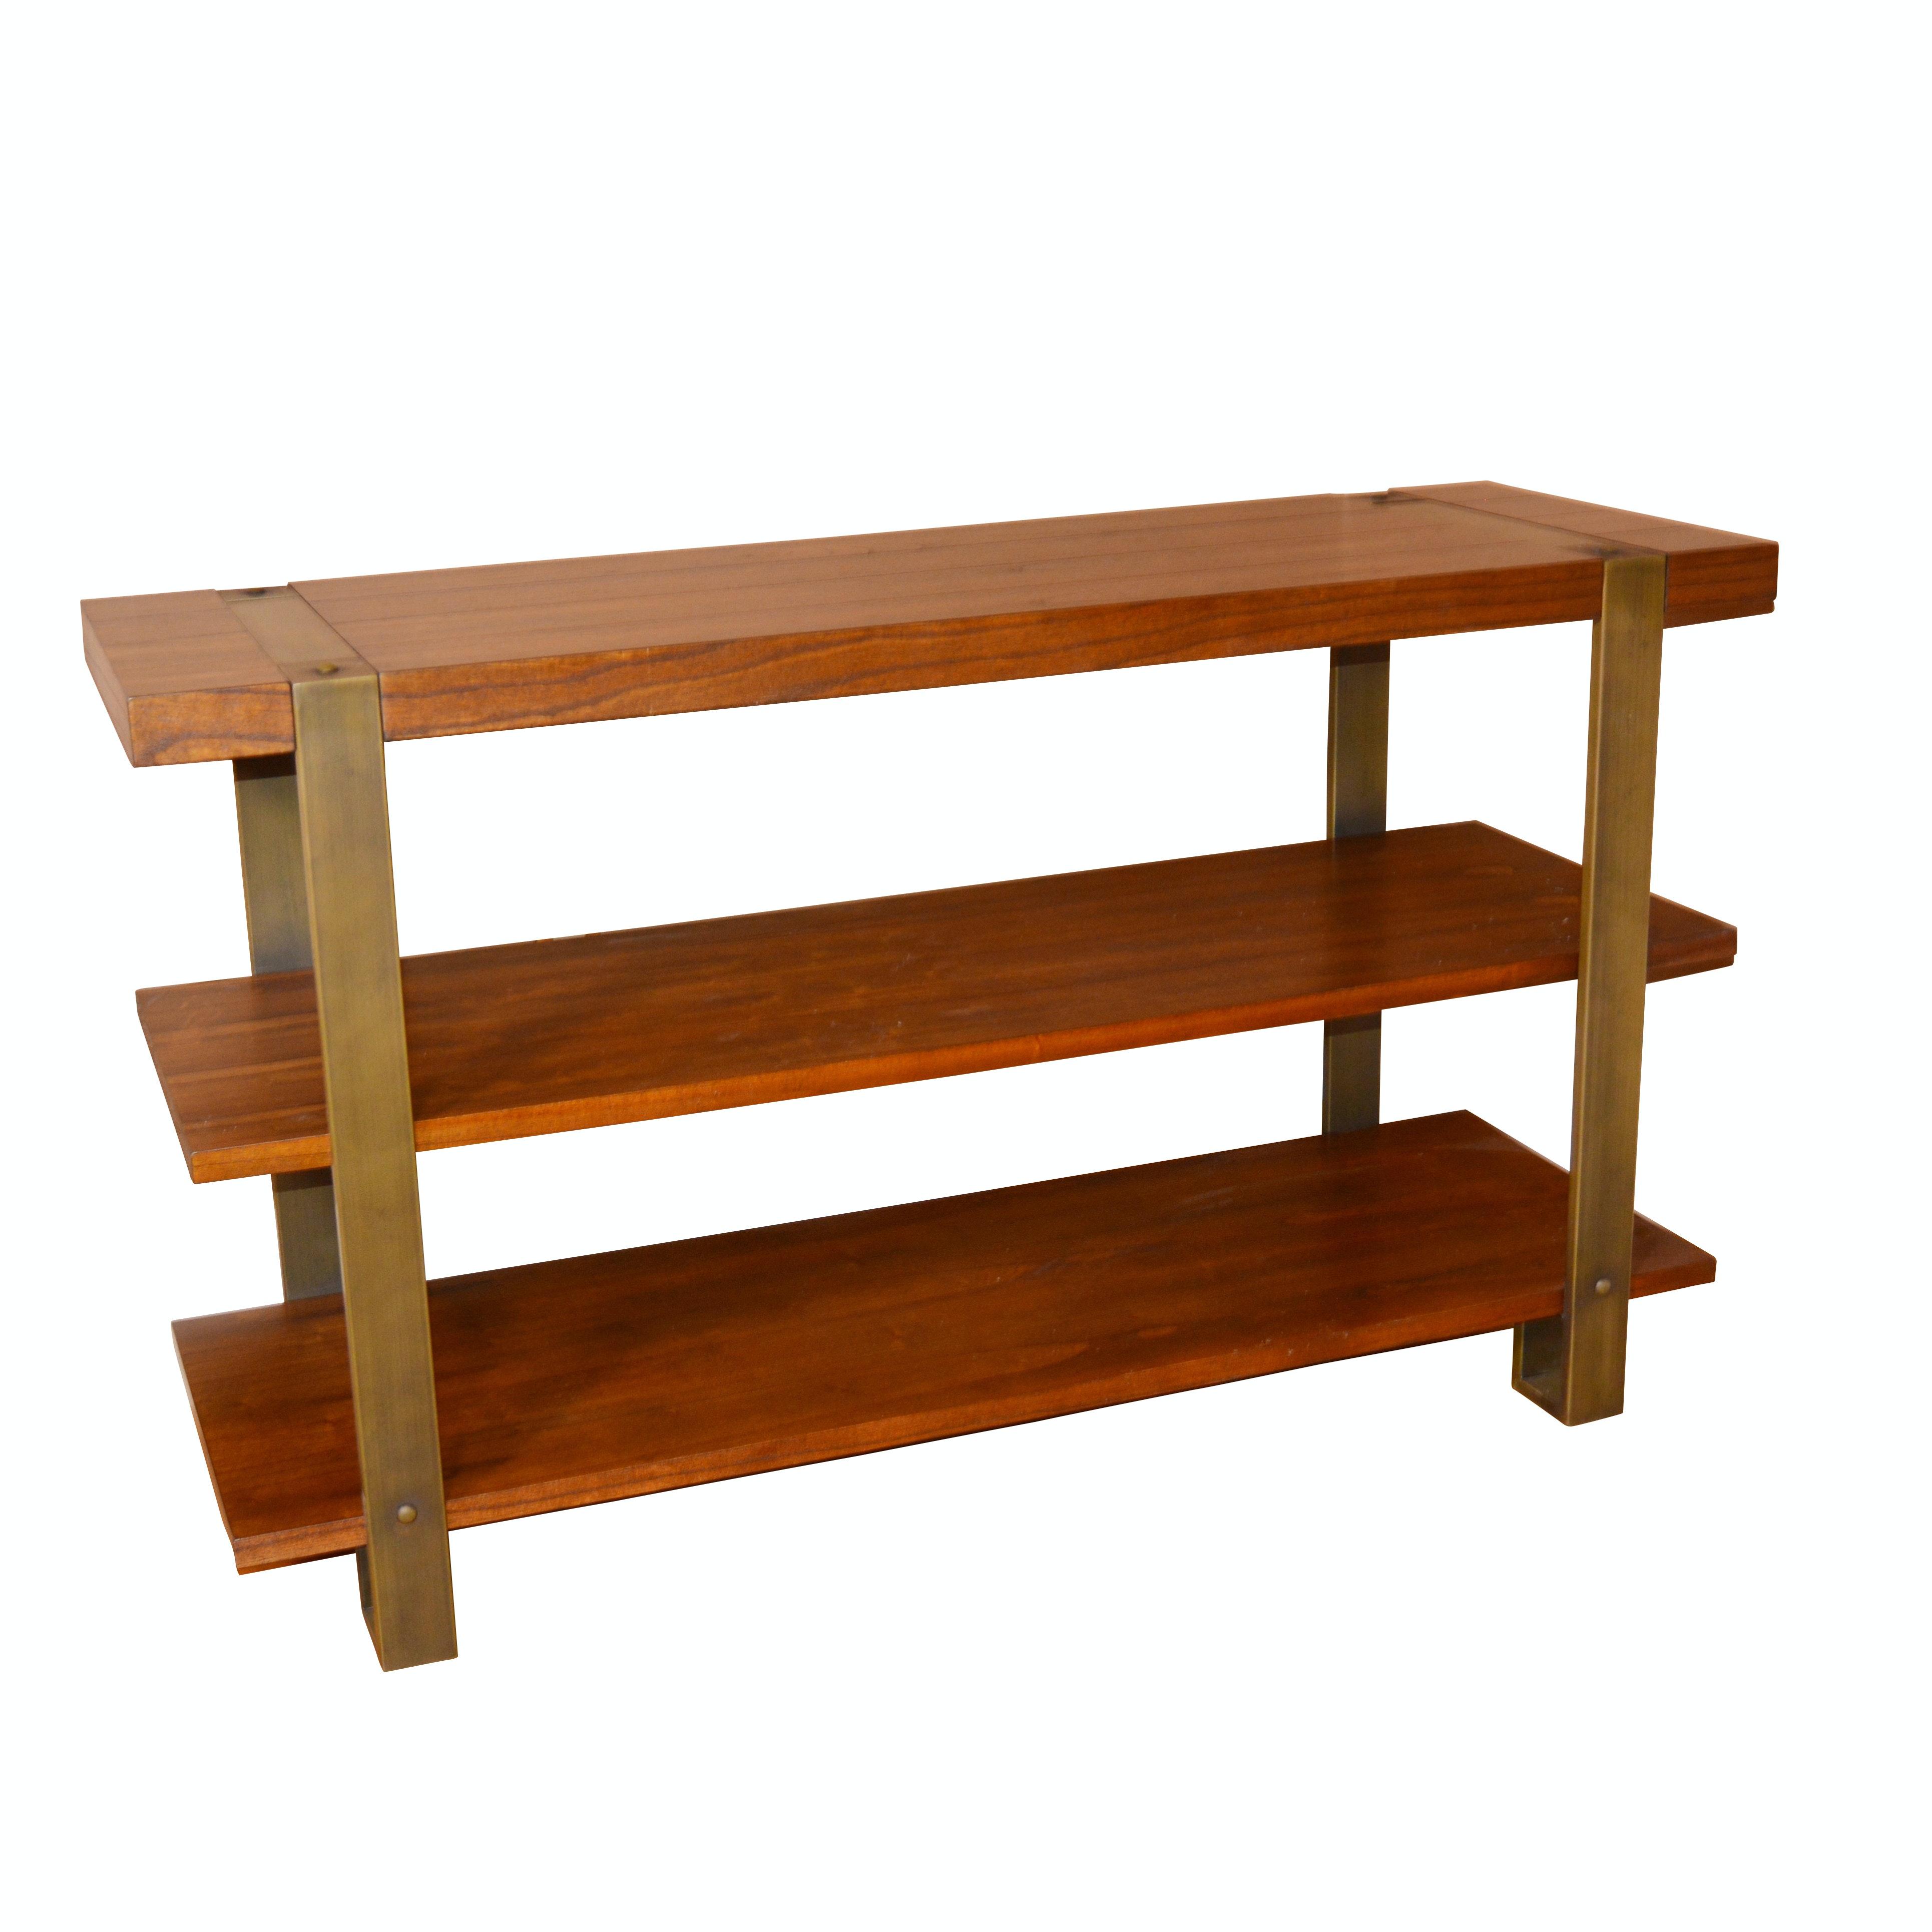 Contemporary Wood and Metal Media Shelf by Calmart International Ltd